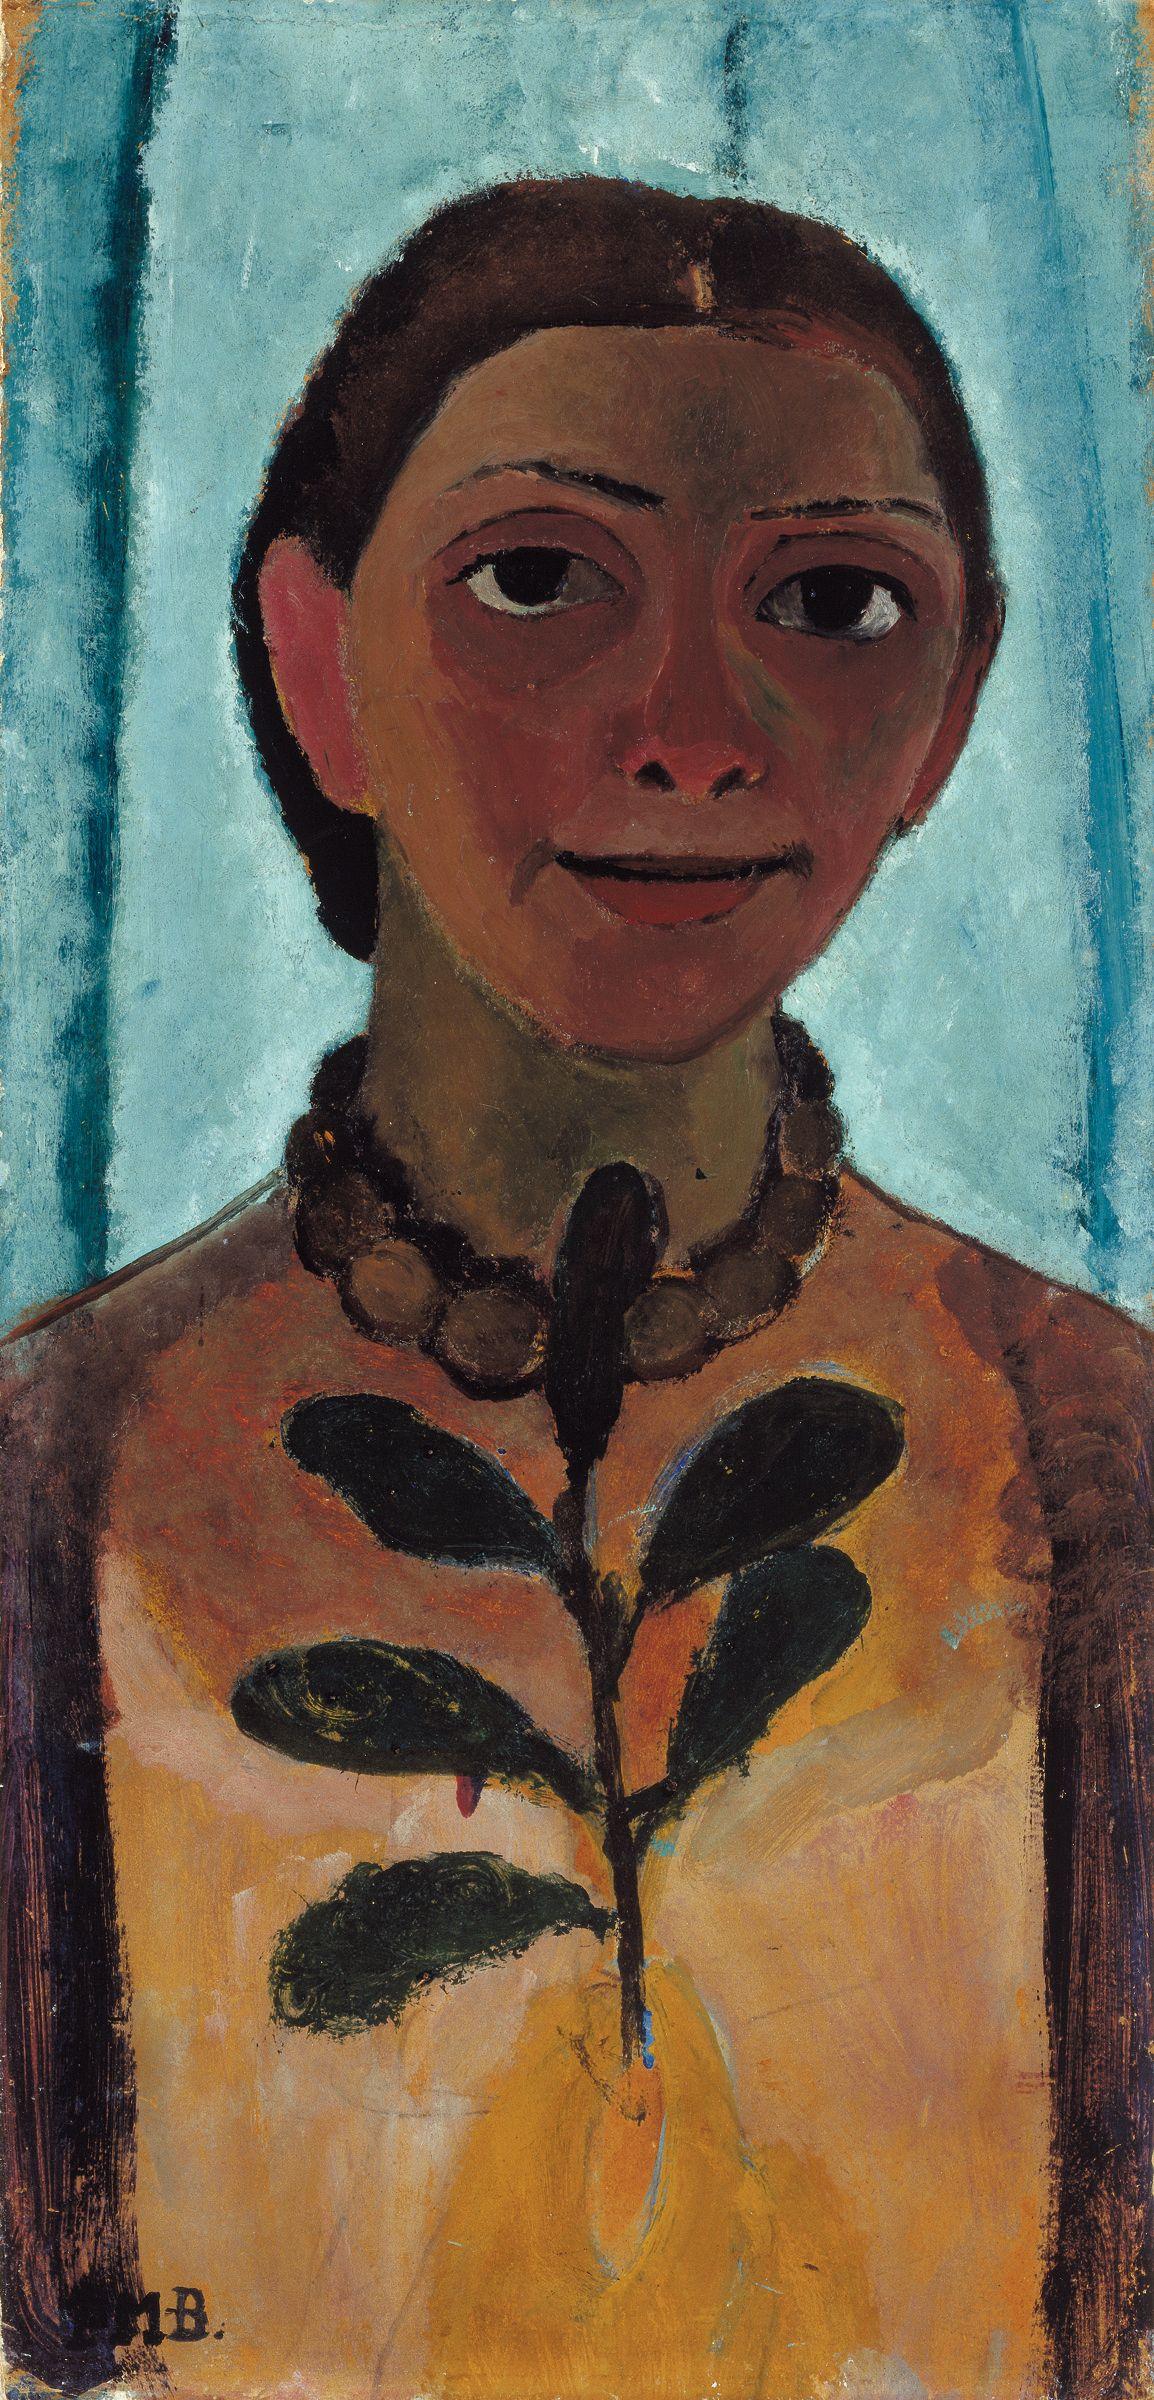 Paula Modersohn-Becker: Selbstbildnis mit Kamelienzweig, 1906/07, Öltempera auf Pappe, 61,5 x 30,5 cm, Museum Folkwang, Essen